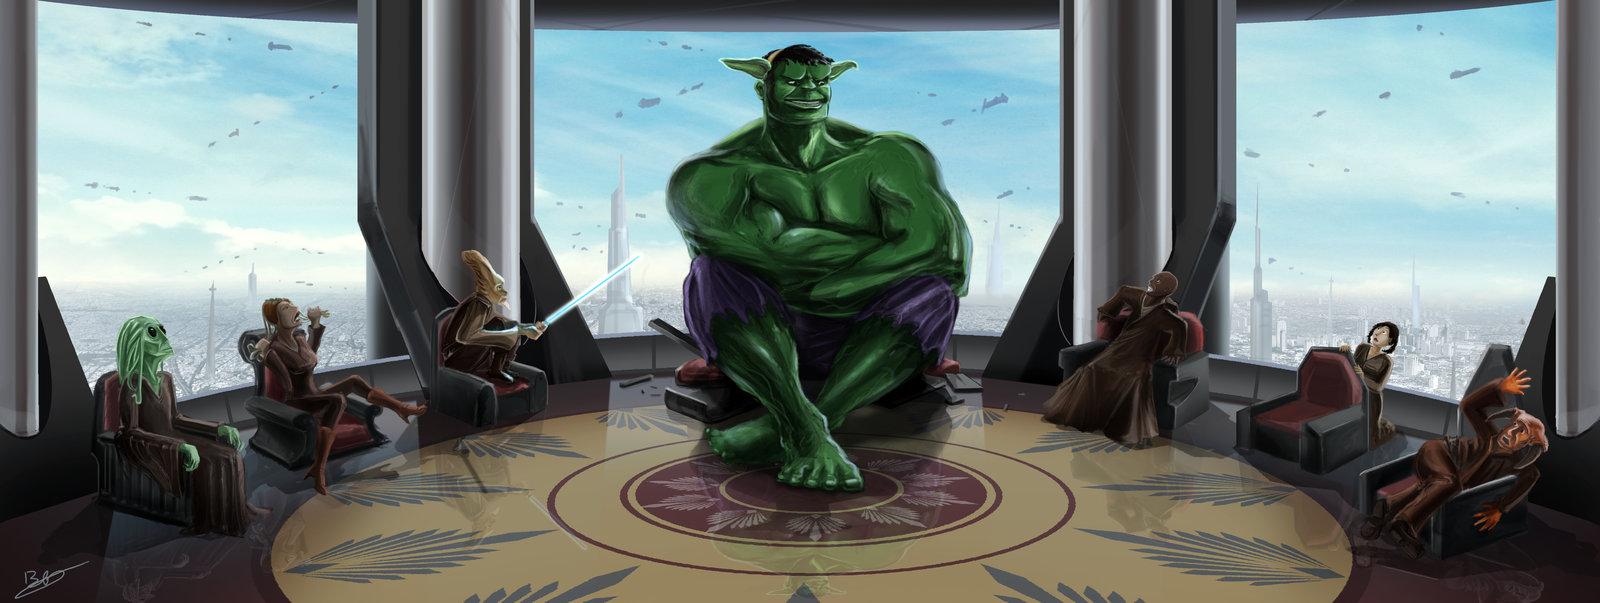 Music Quotes Wallpaper Guitar Yoda Hulk Meme And Photo Collection Geektyrant